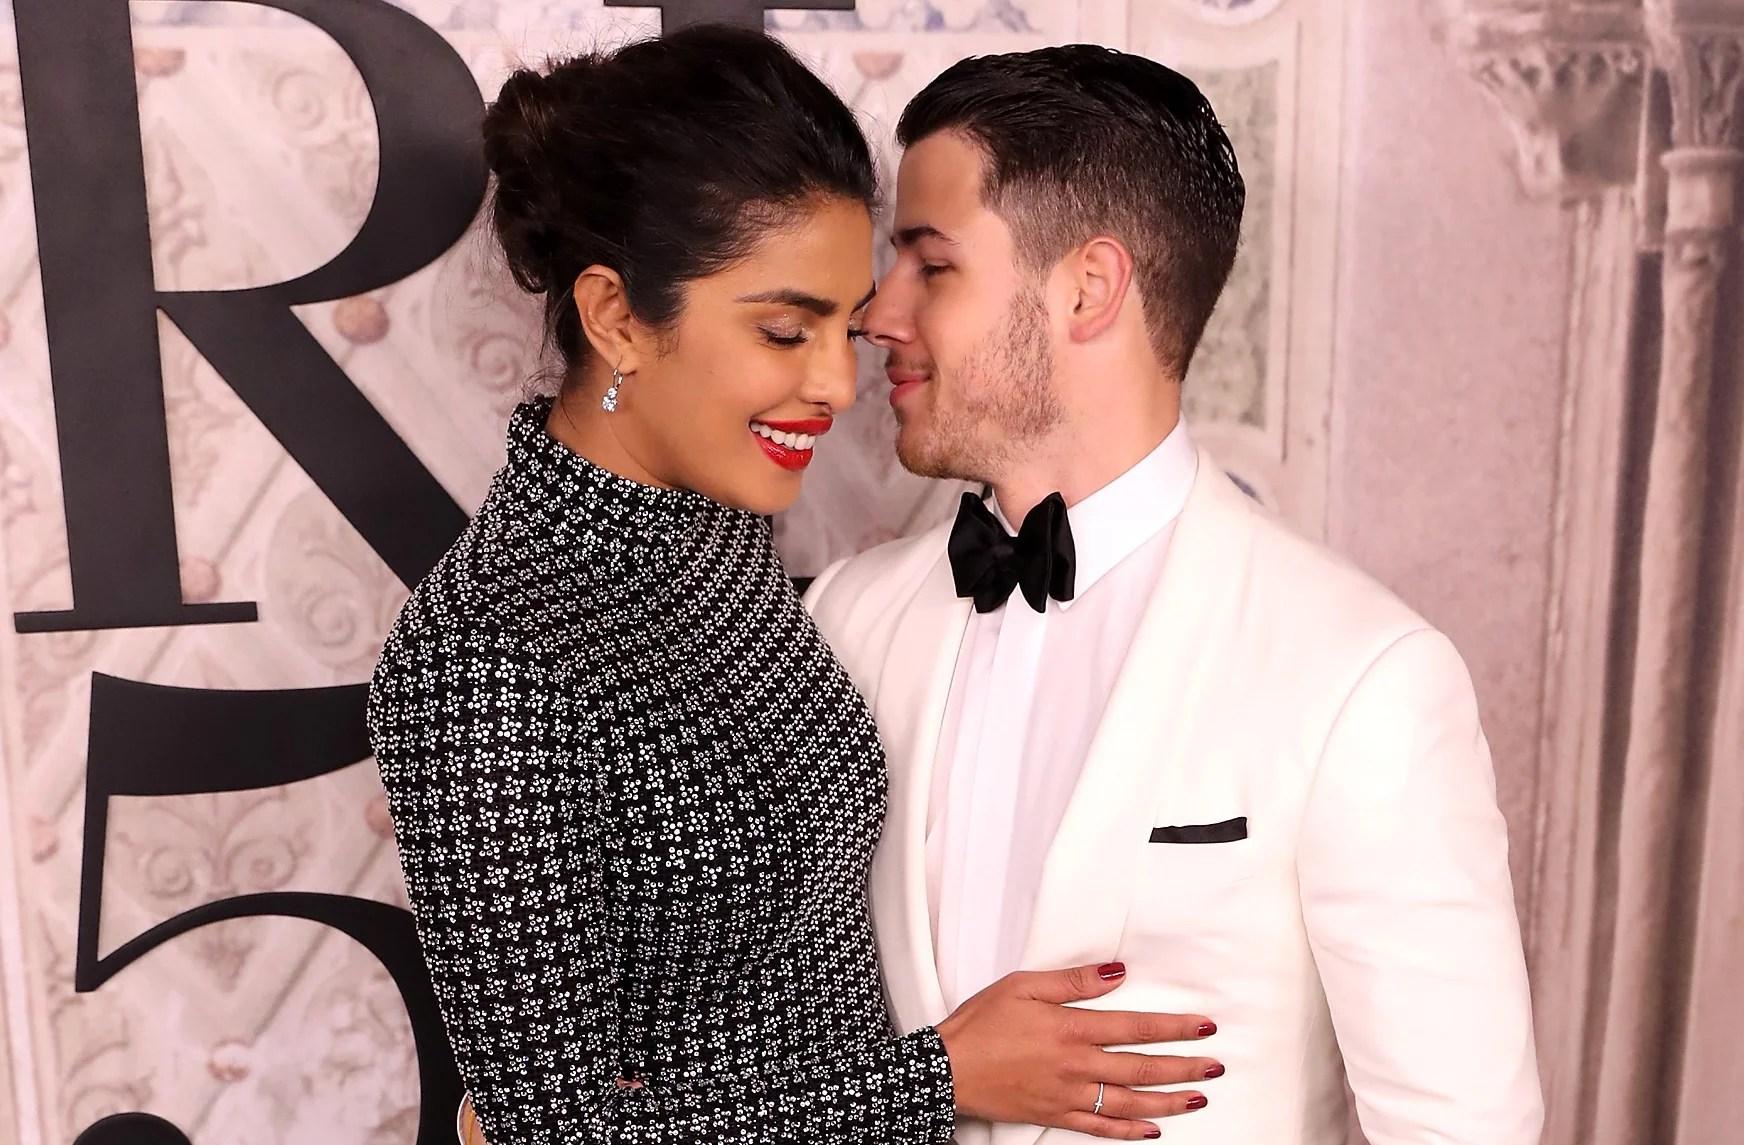 How Old Are Nick Jonas And Priyanka Chopra